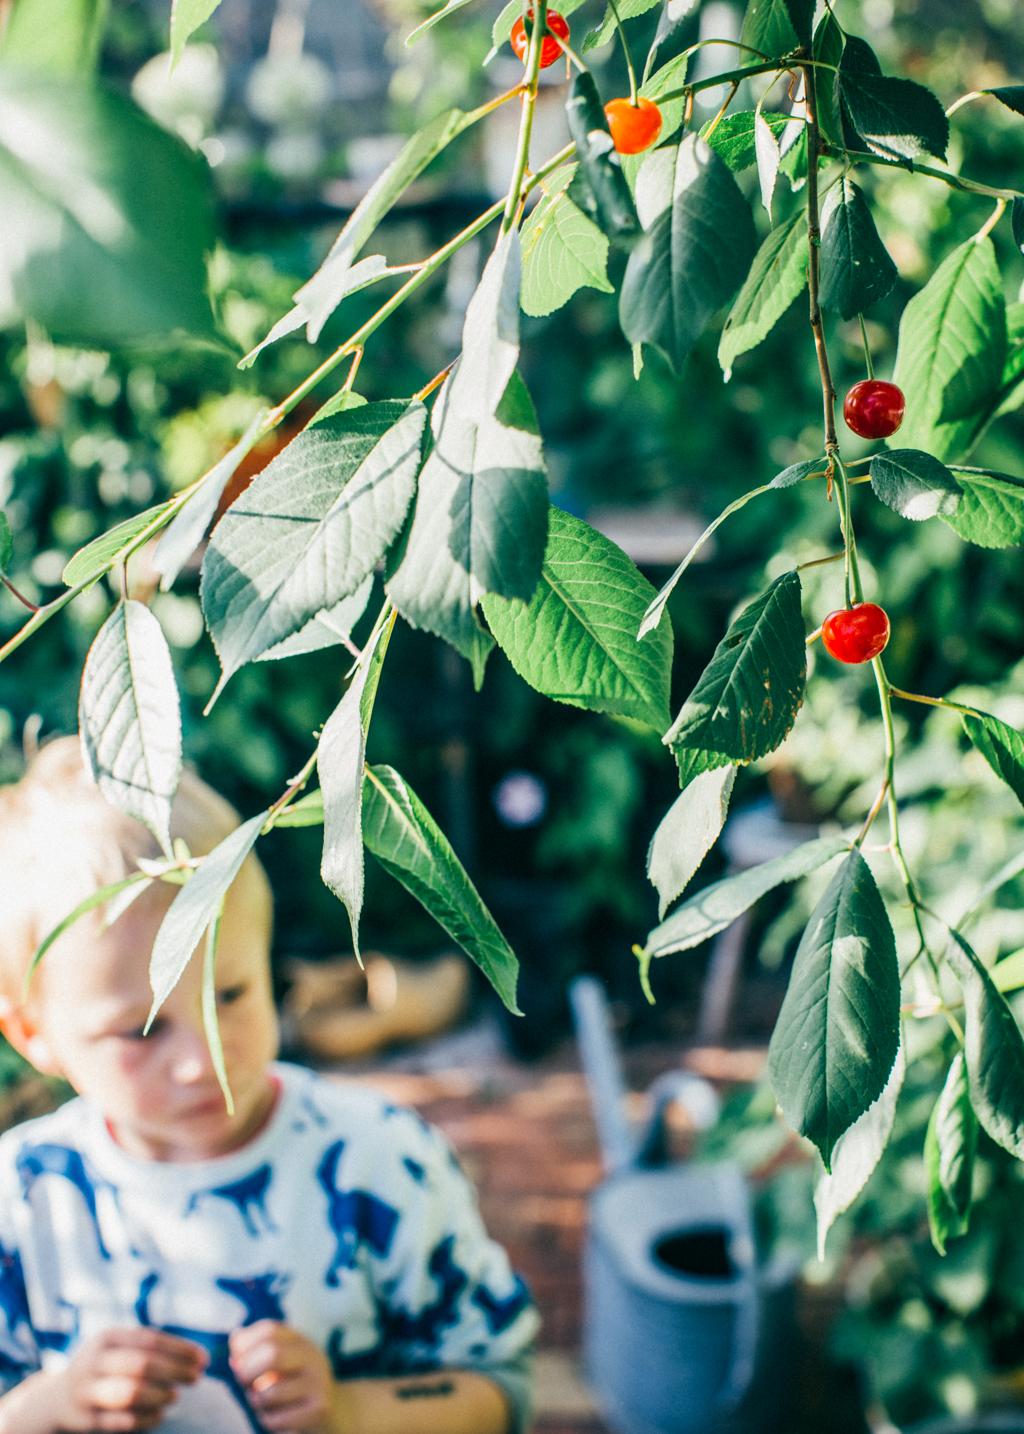 ship_garden_sommar_kristin lagerqvist-5863